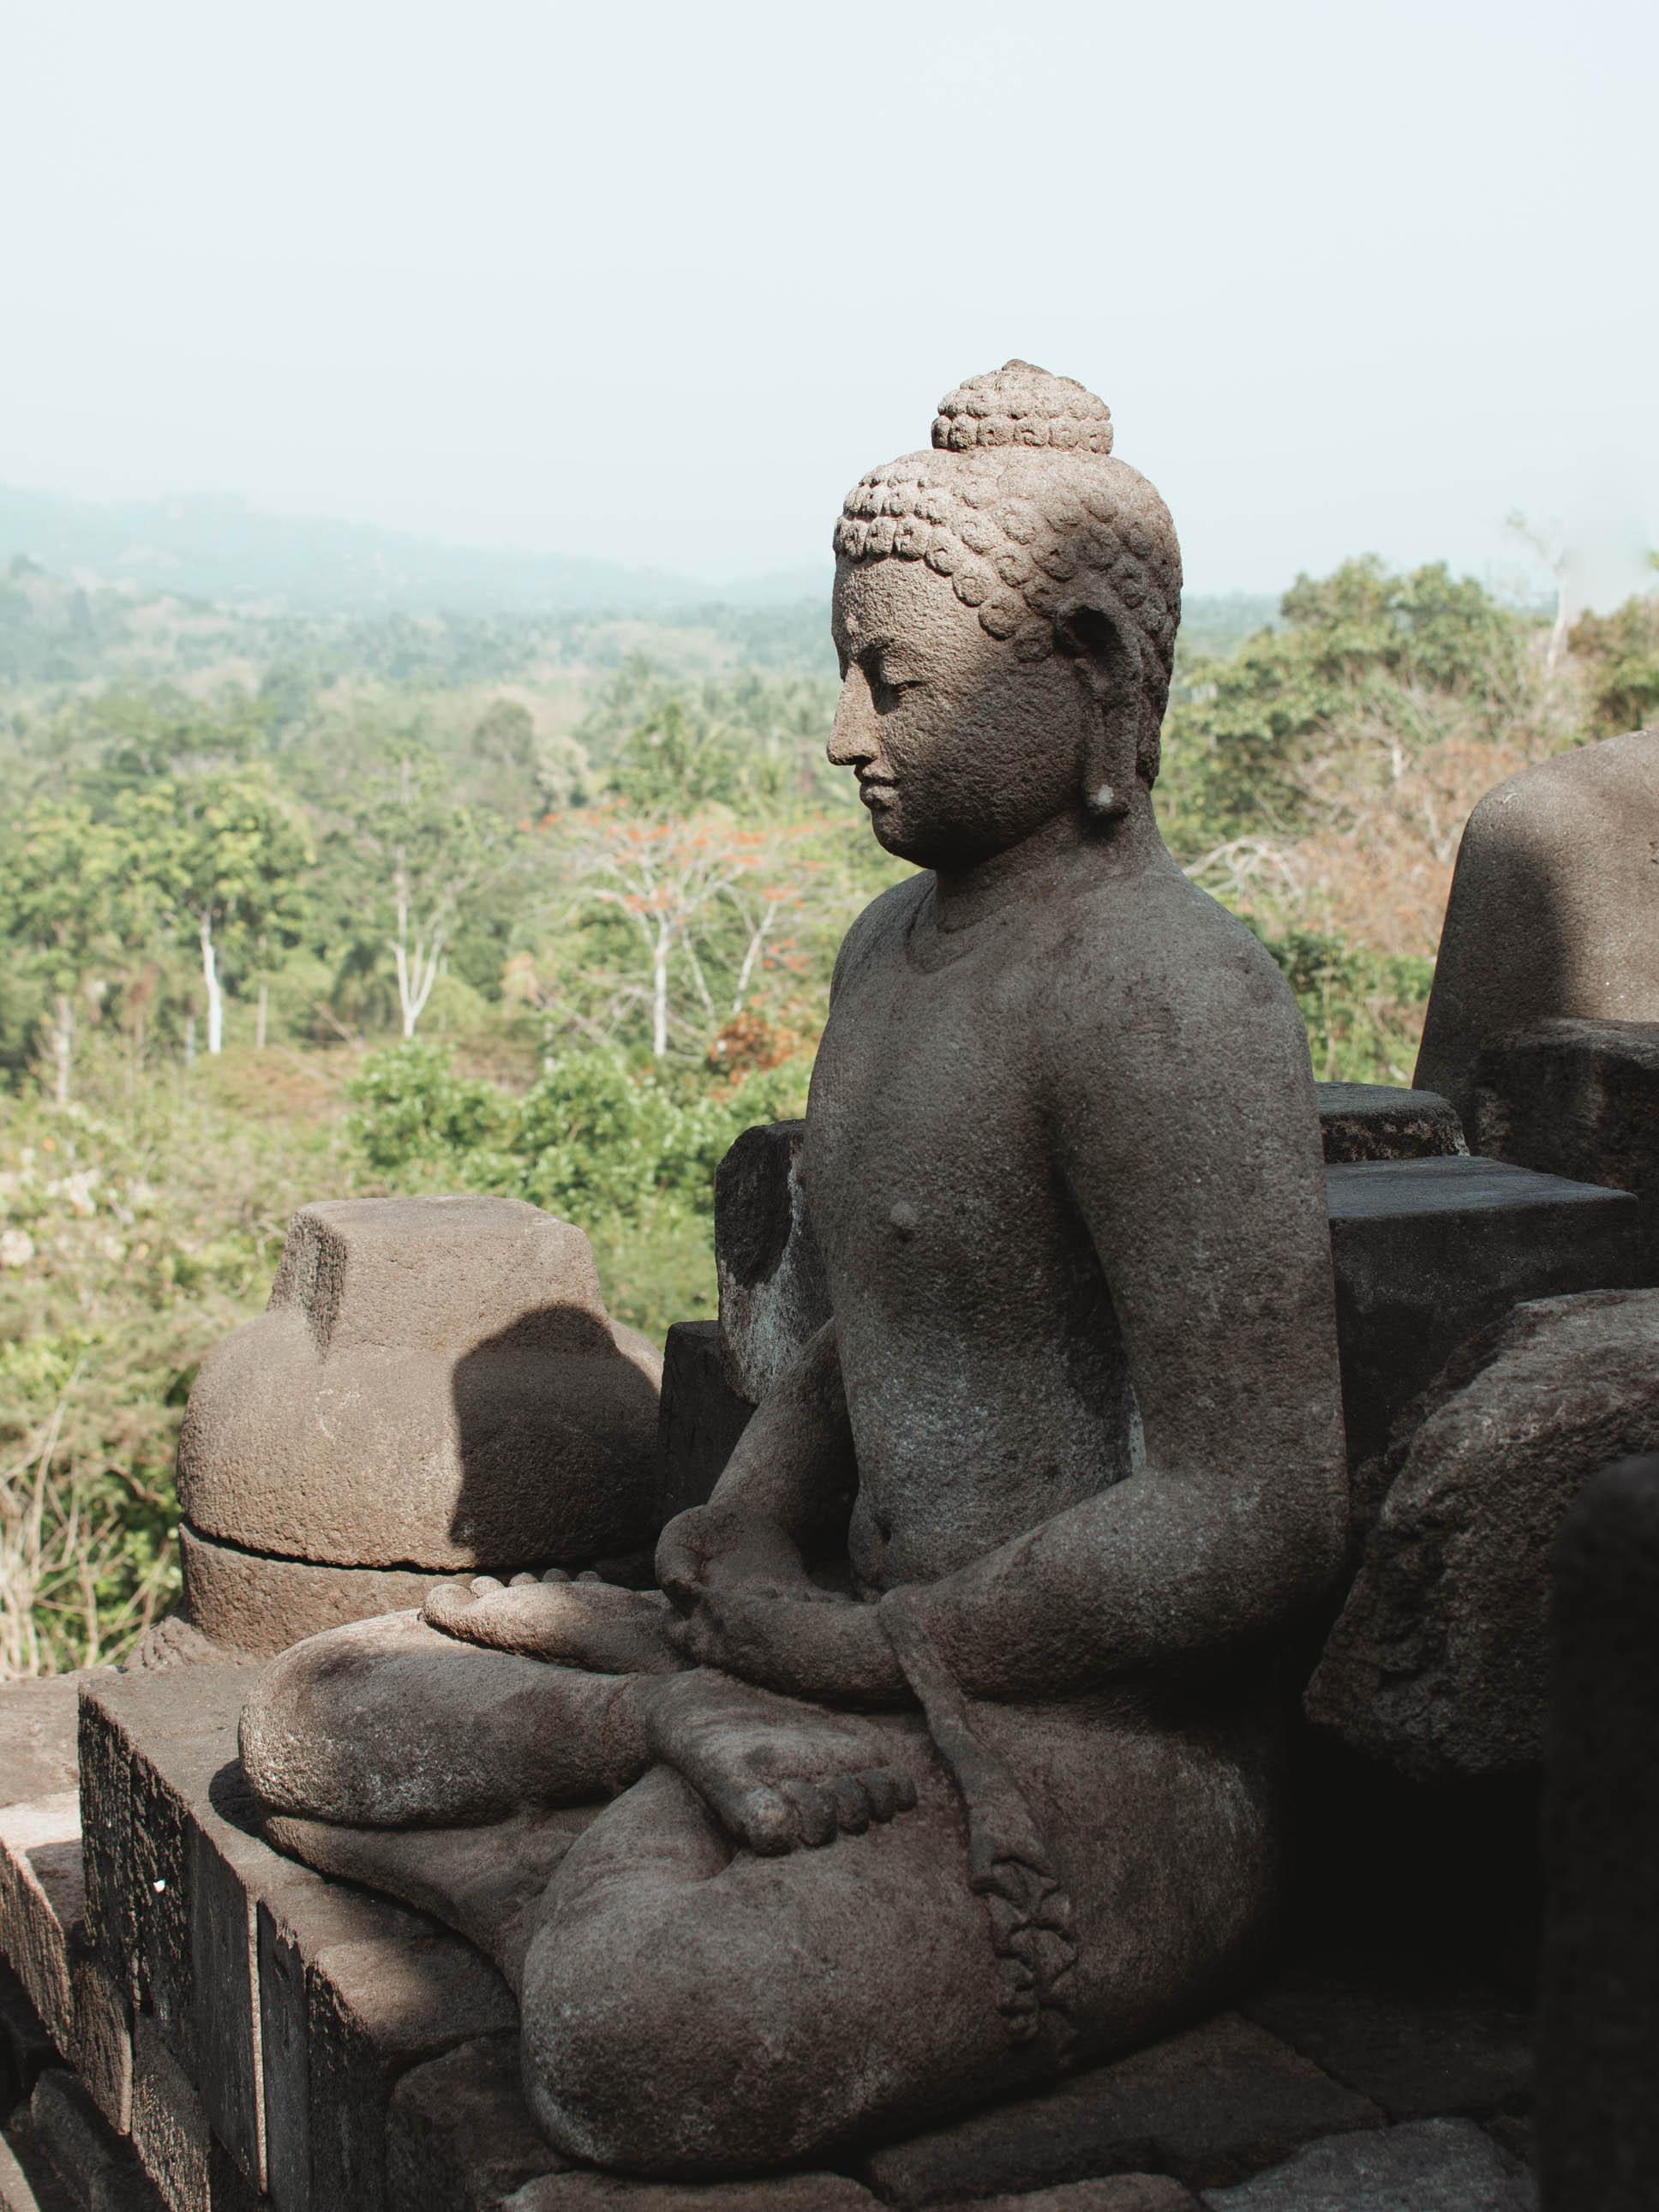 A carving of Buddha at Borobudur temple in Yogyakarta, Indonesia